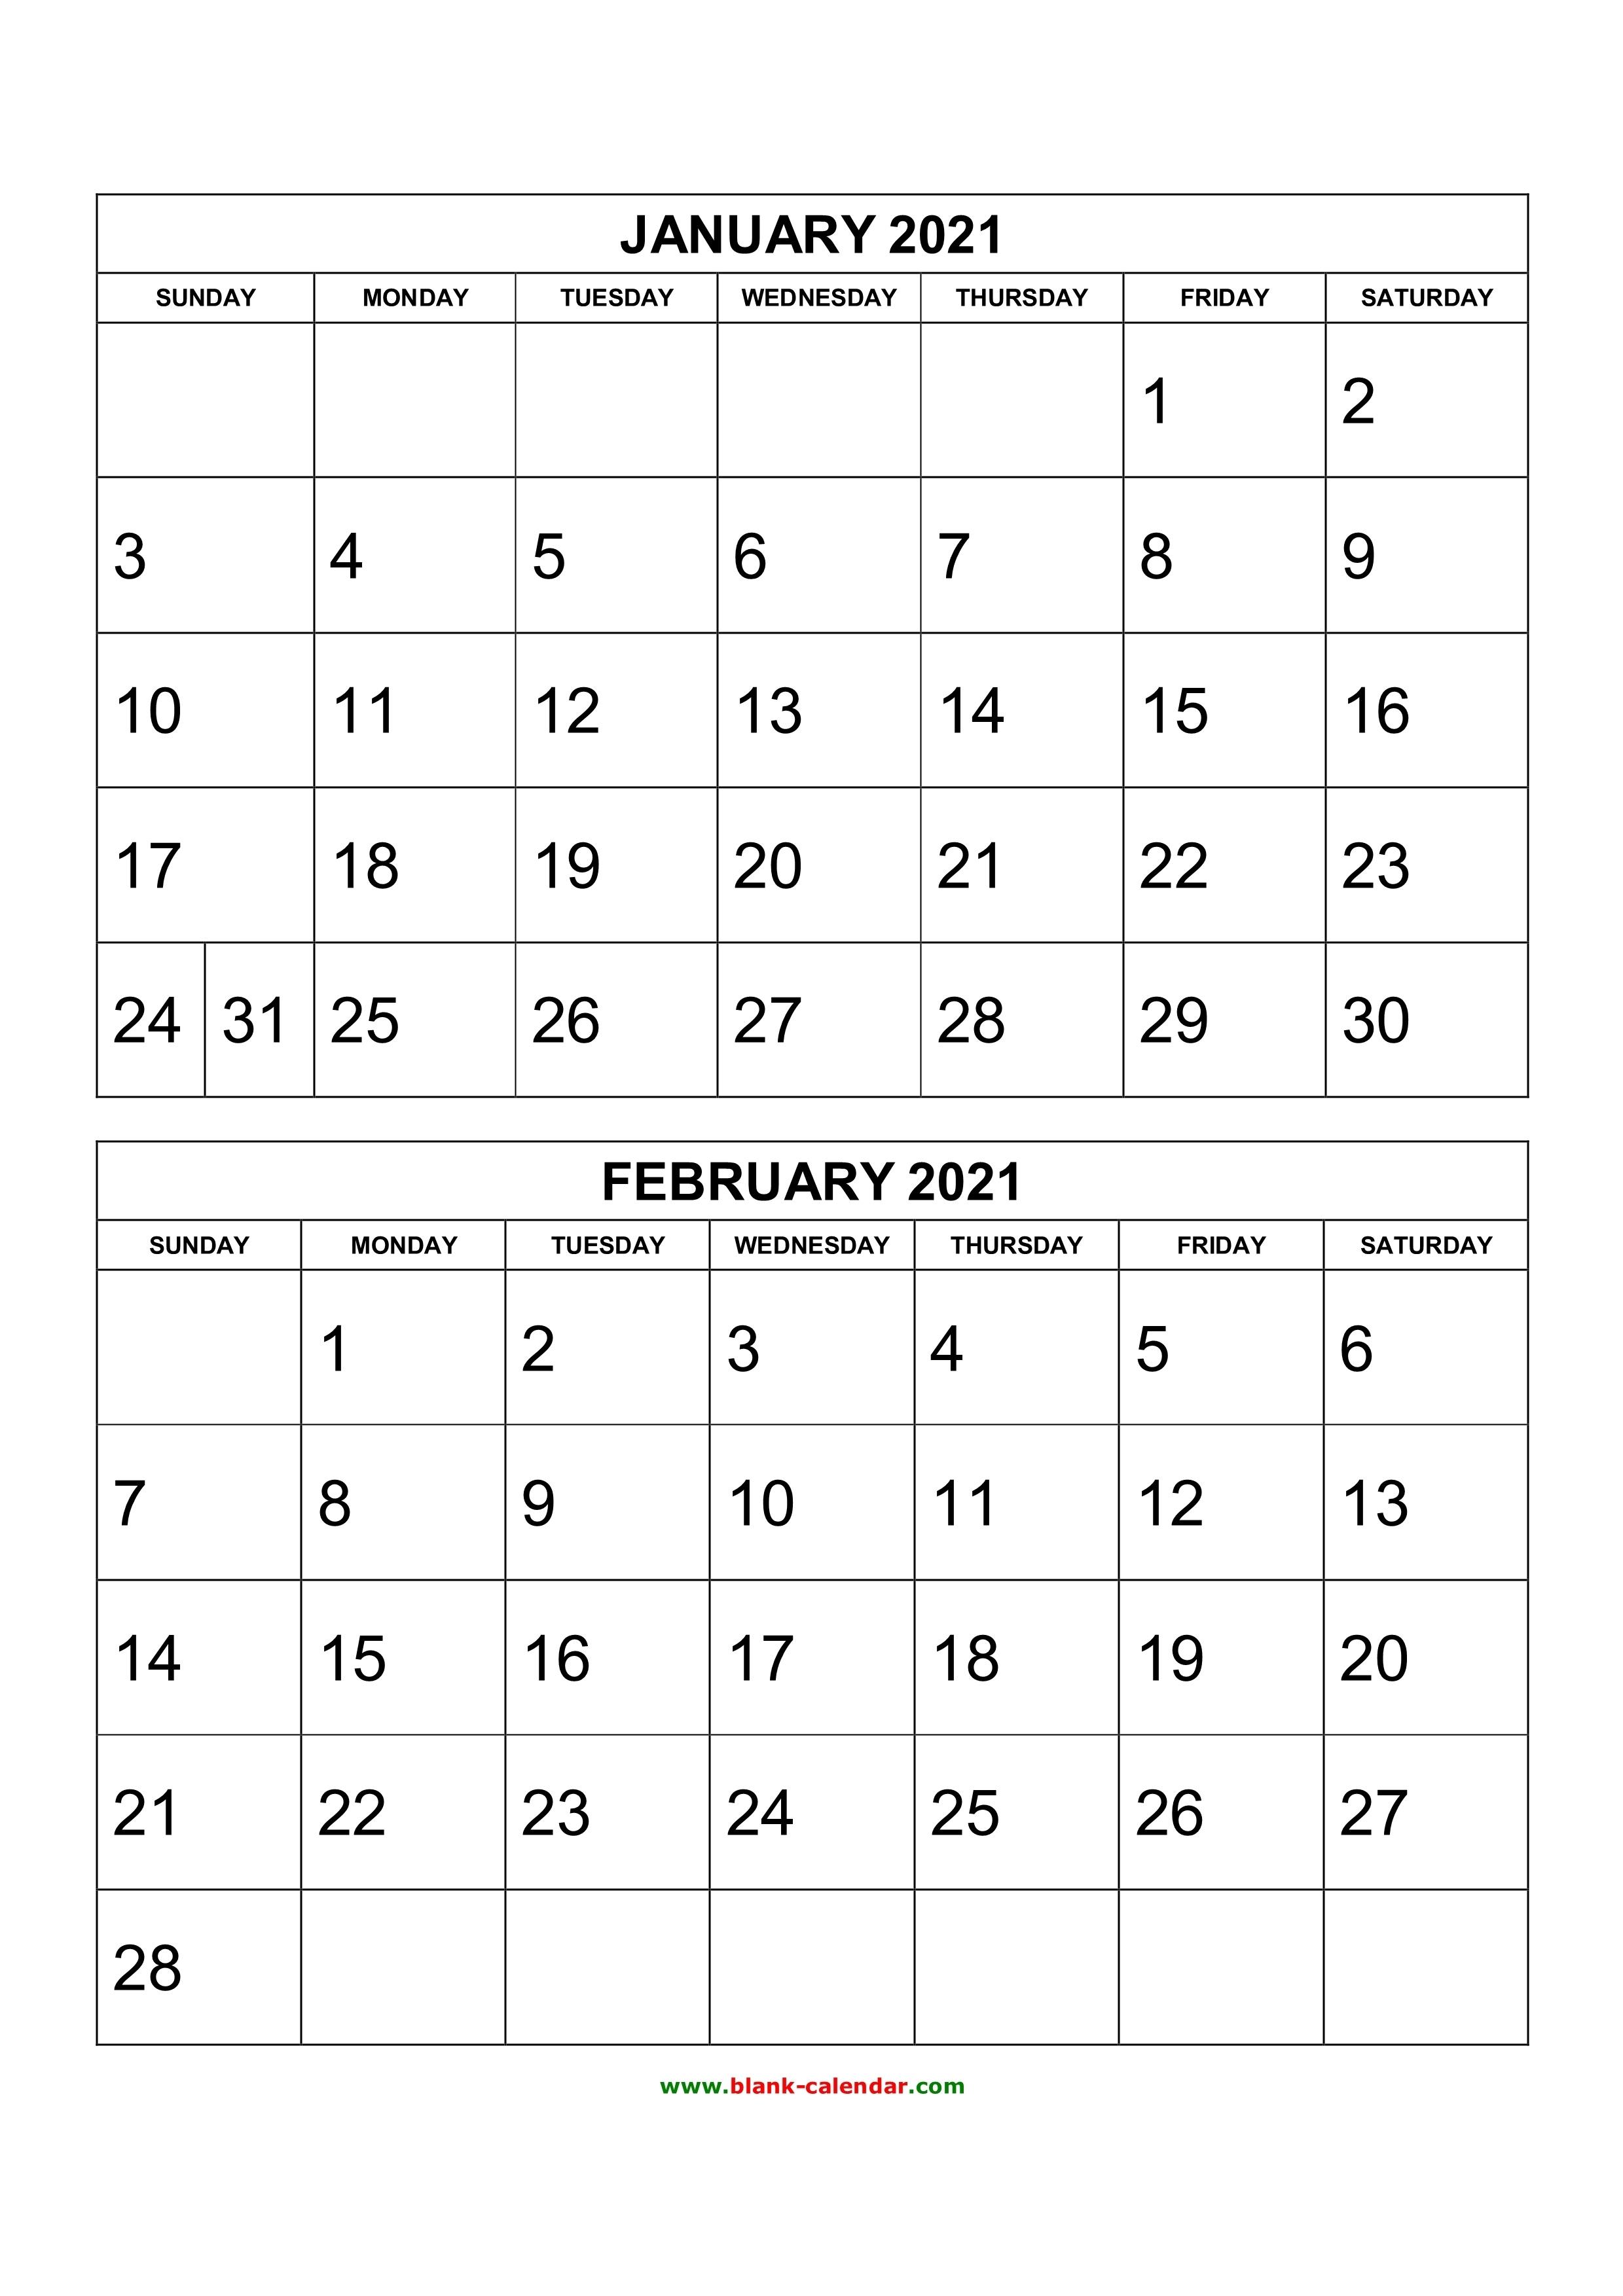 Free Download Printable Calendar 2021, 2 Months Per Page, 6 Free Printable 3 Month Calendar 2021